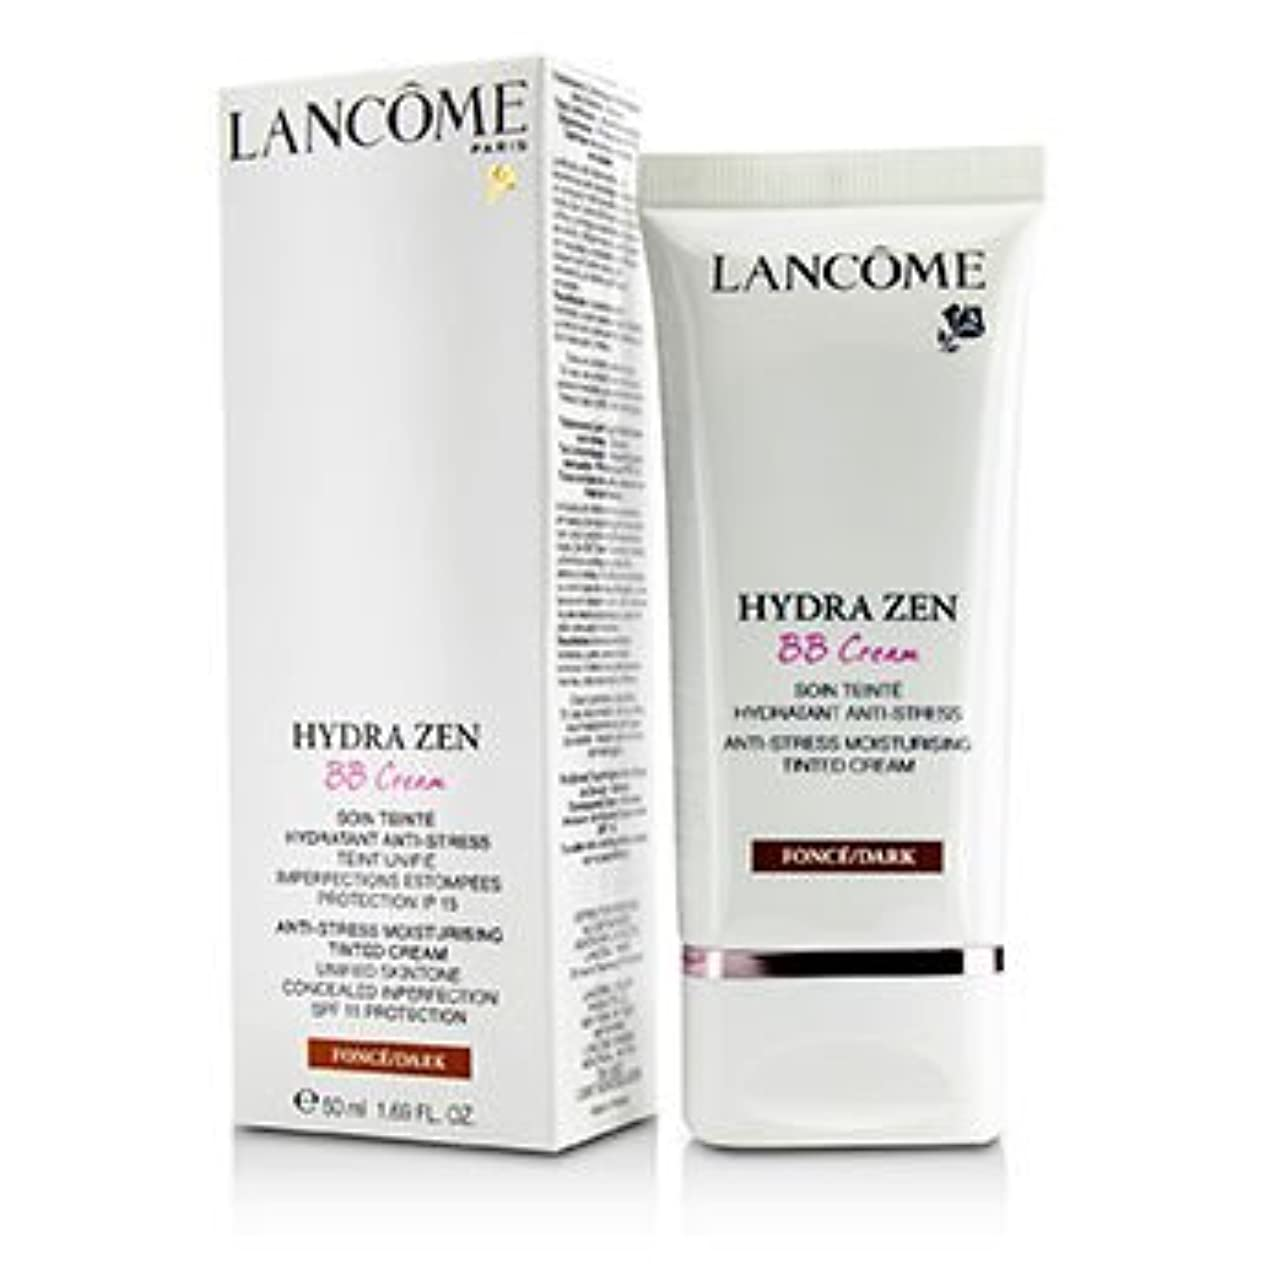 無実手数料肉屋[Lancome] Lancome Hydra Zen (BB Cream) Anti-Stress Moisturising Tinted Cream SPF 15 - # Dark 50ml/1.69oz